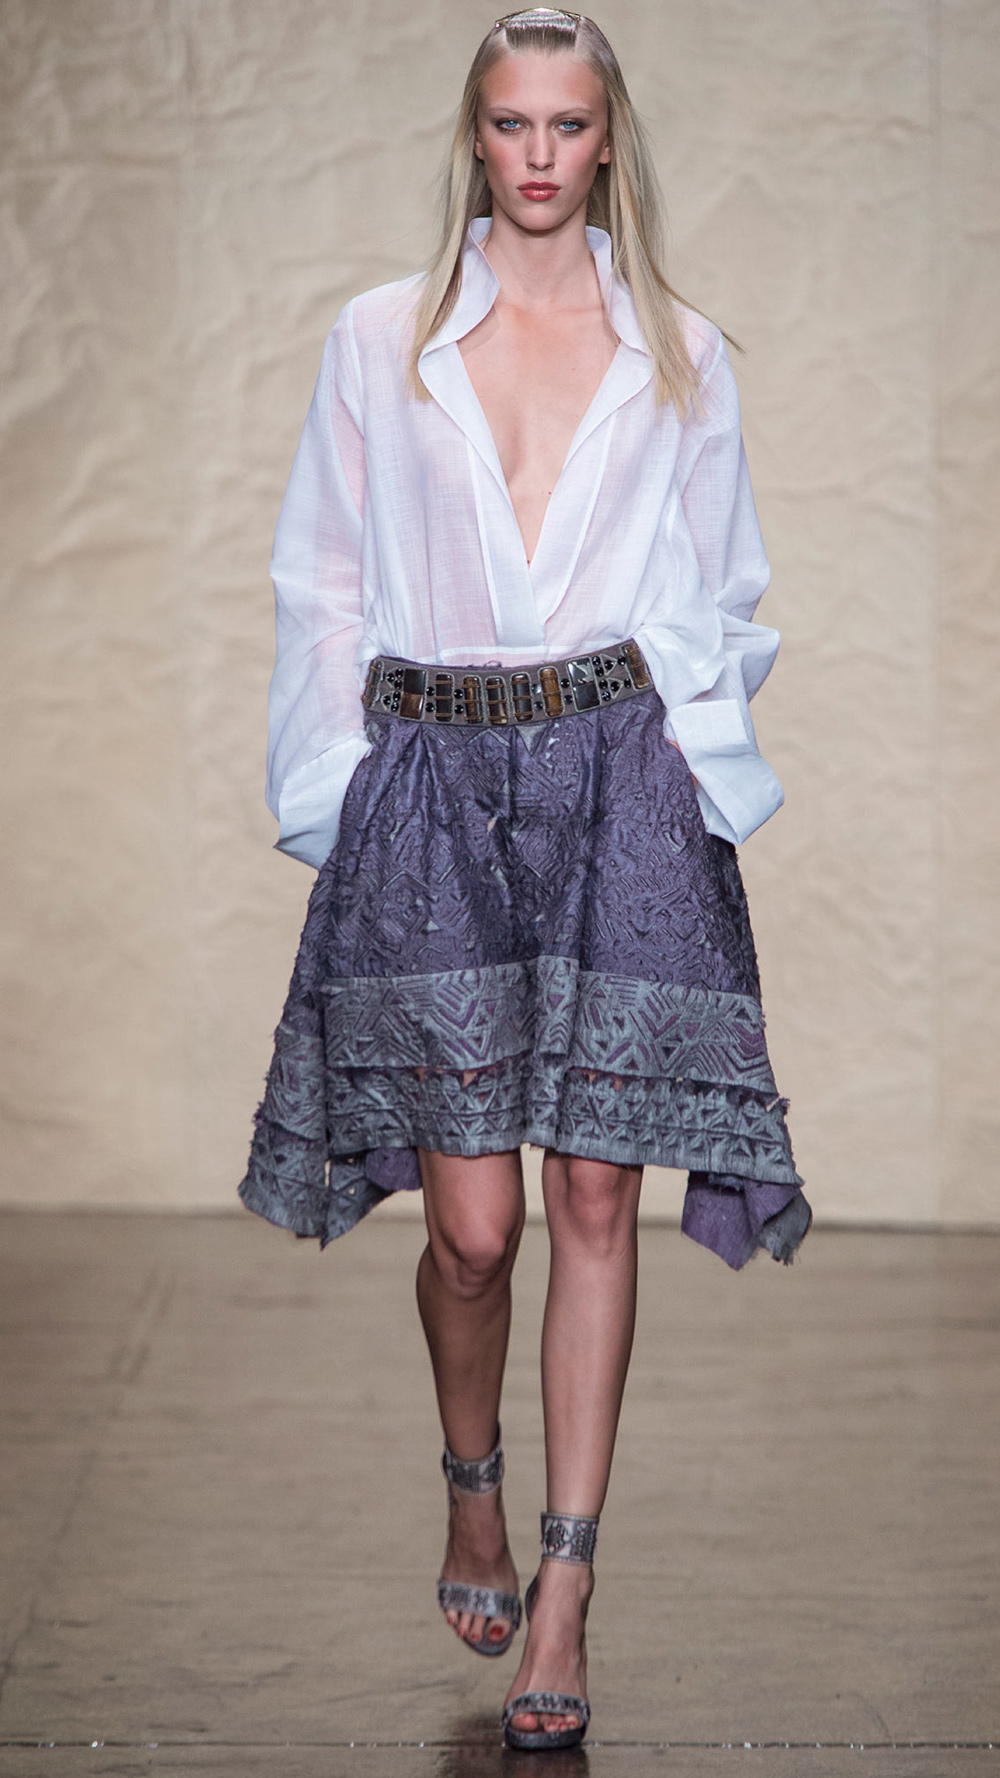 Bohemian Fashion Trend At